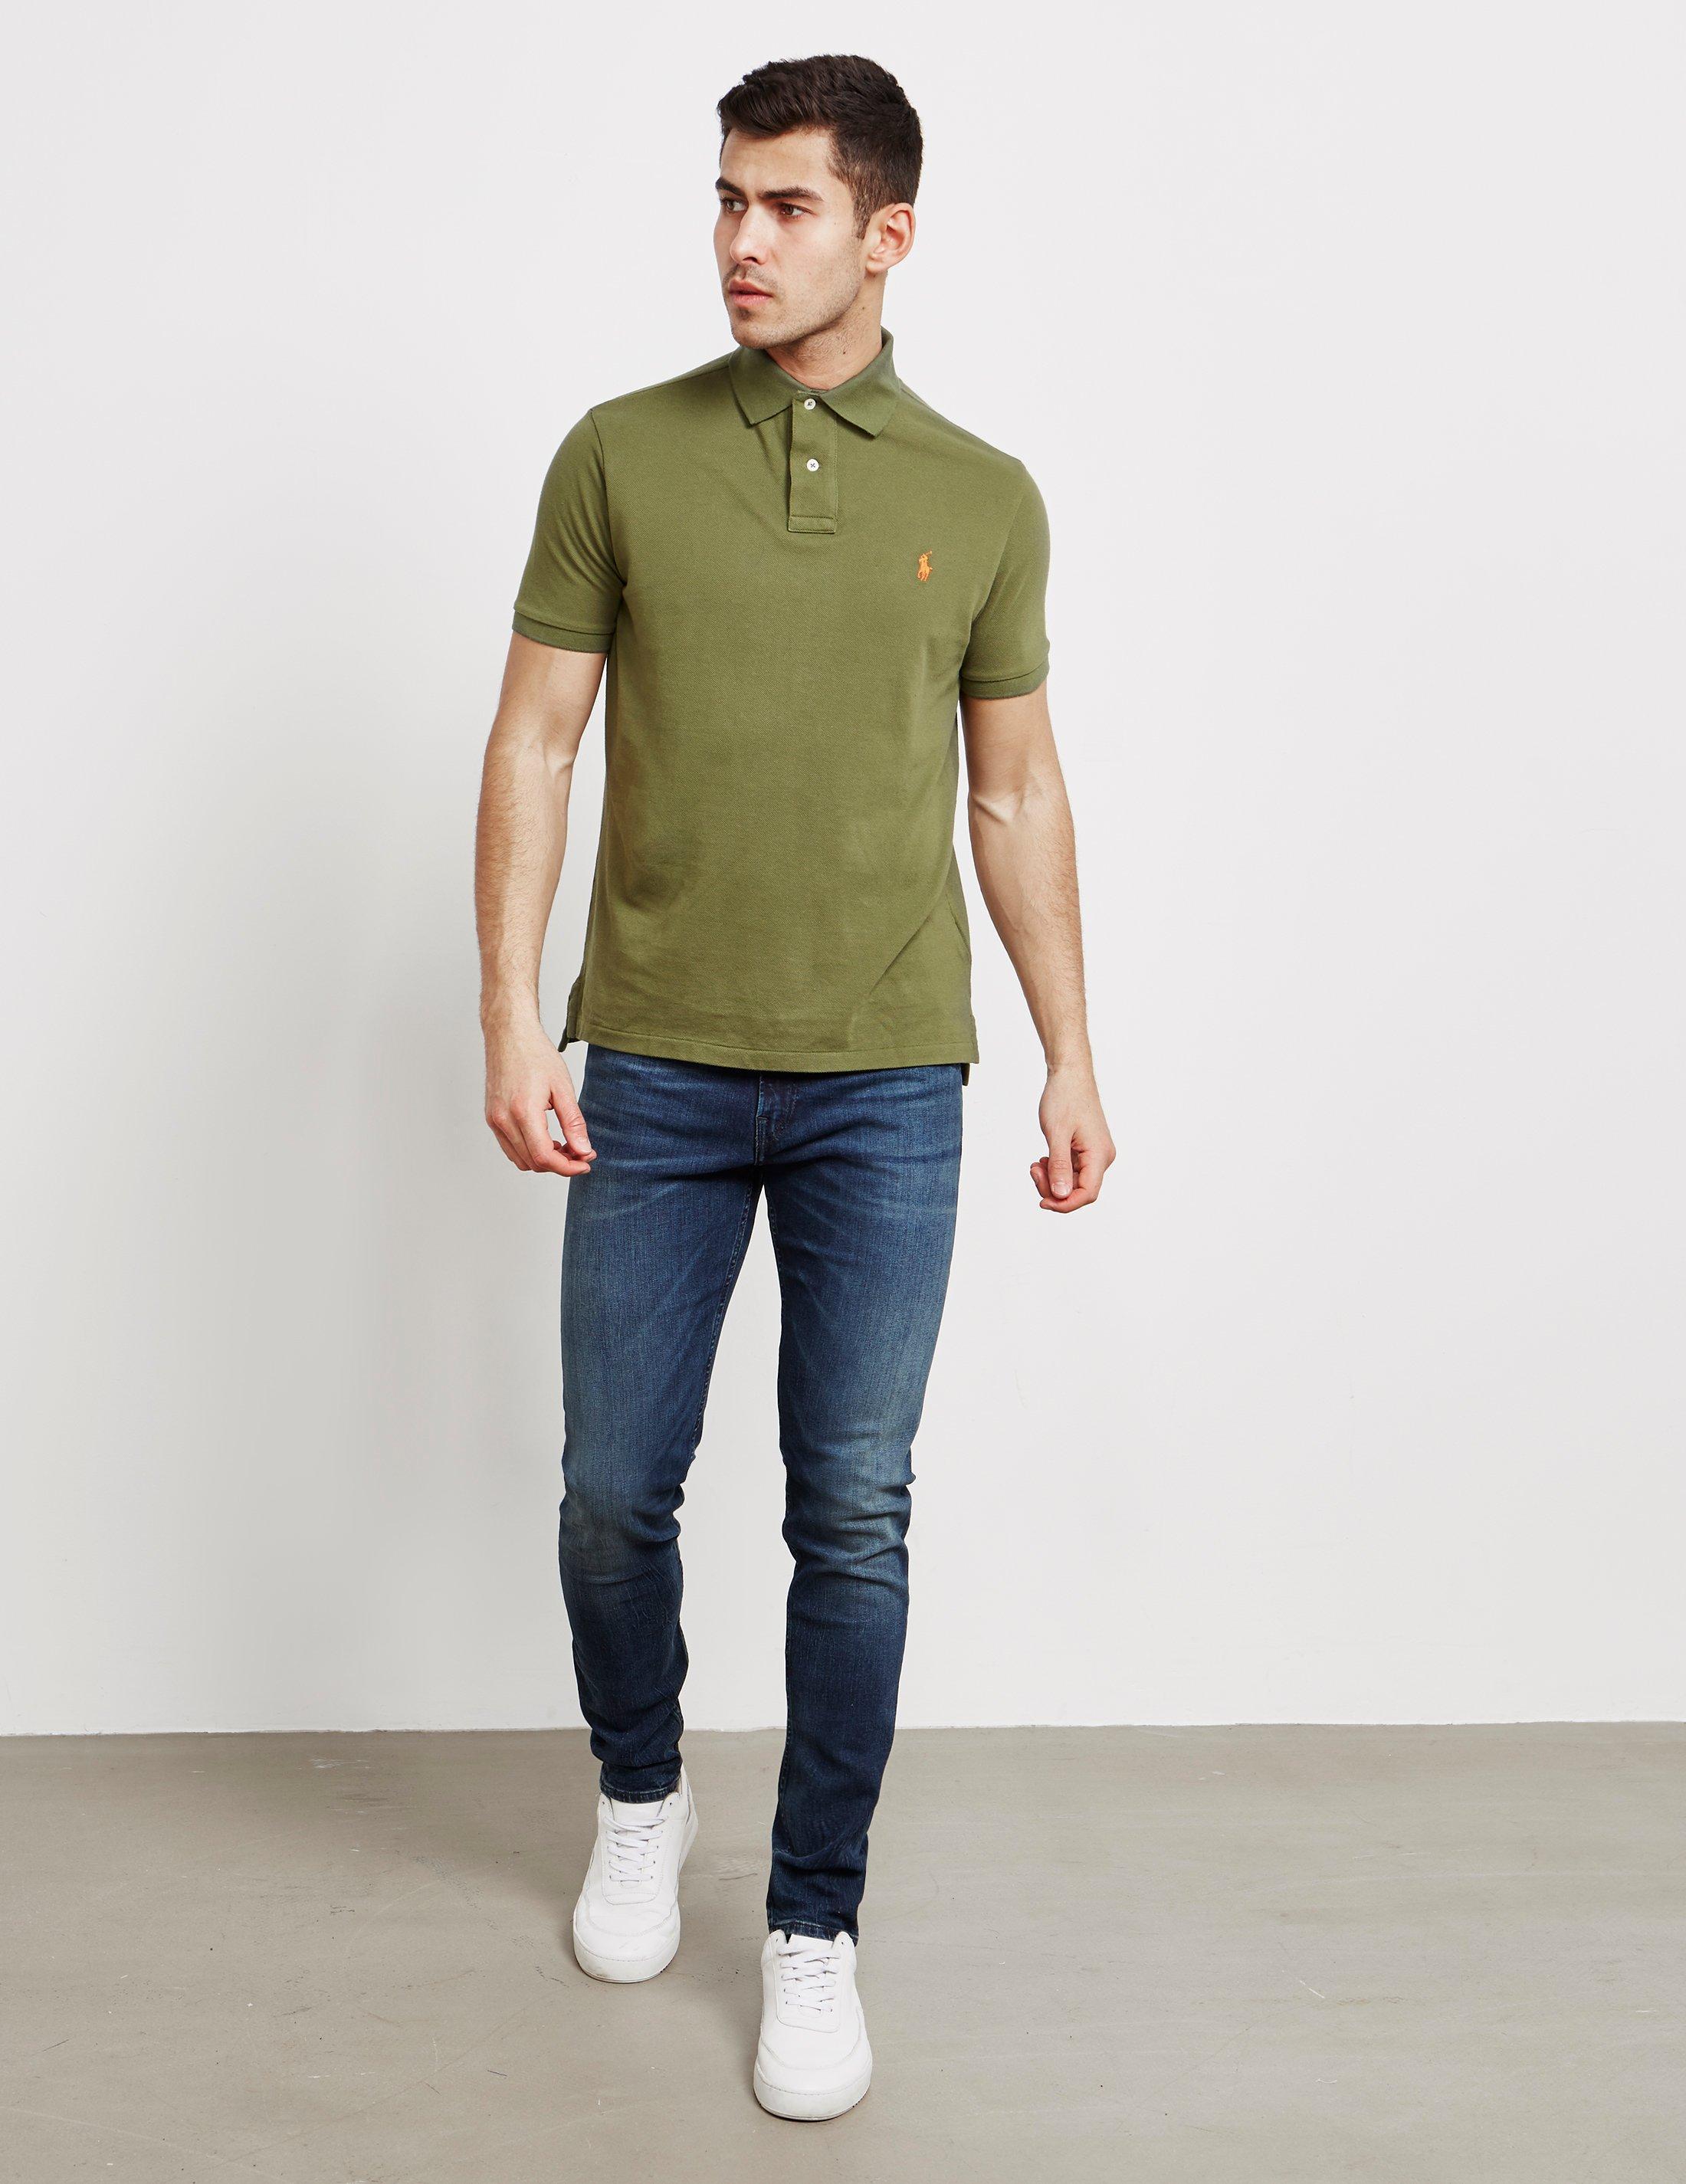 b280bb18 Polo Ralph Lauren Mens Mesh Short Sleeve Polo Shirt Green in Green for Men  - Lyst